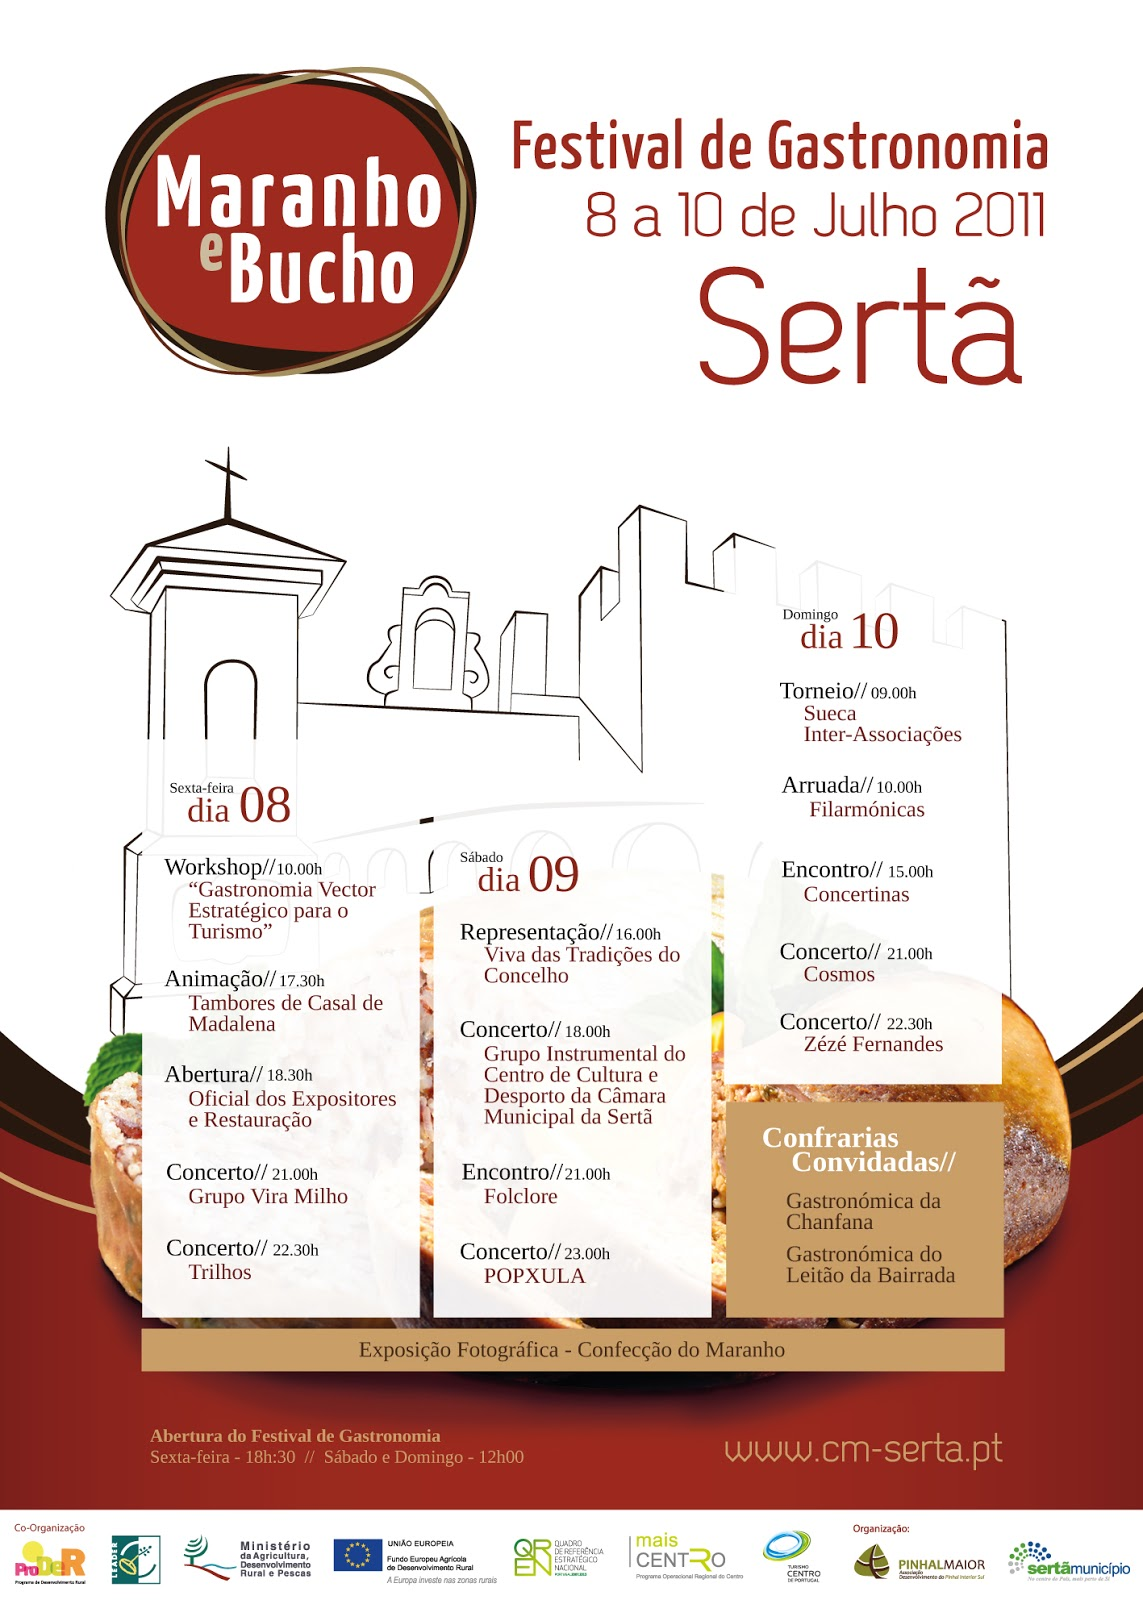 Festival Gastronomia Sertã 2013 - Maranho e Bucho